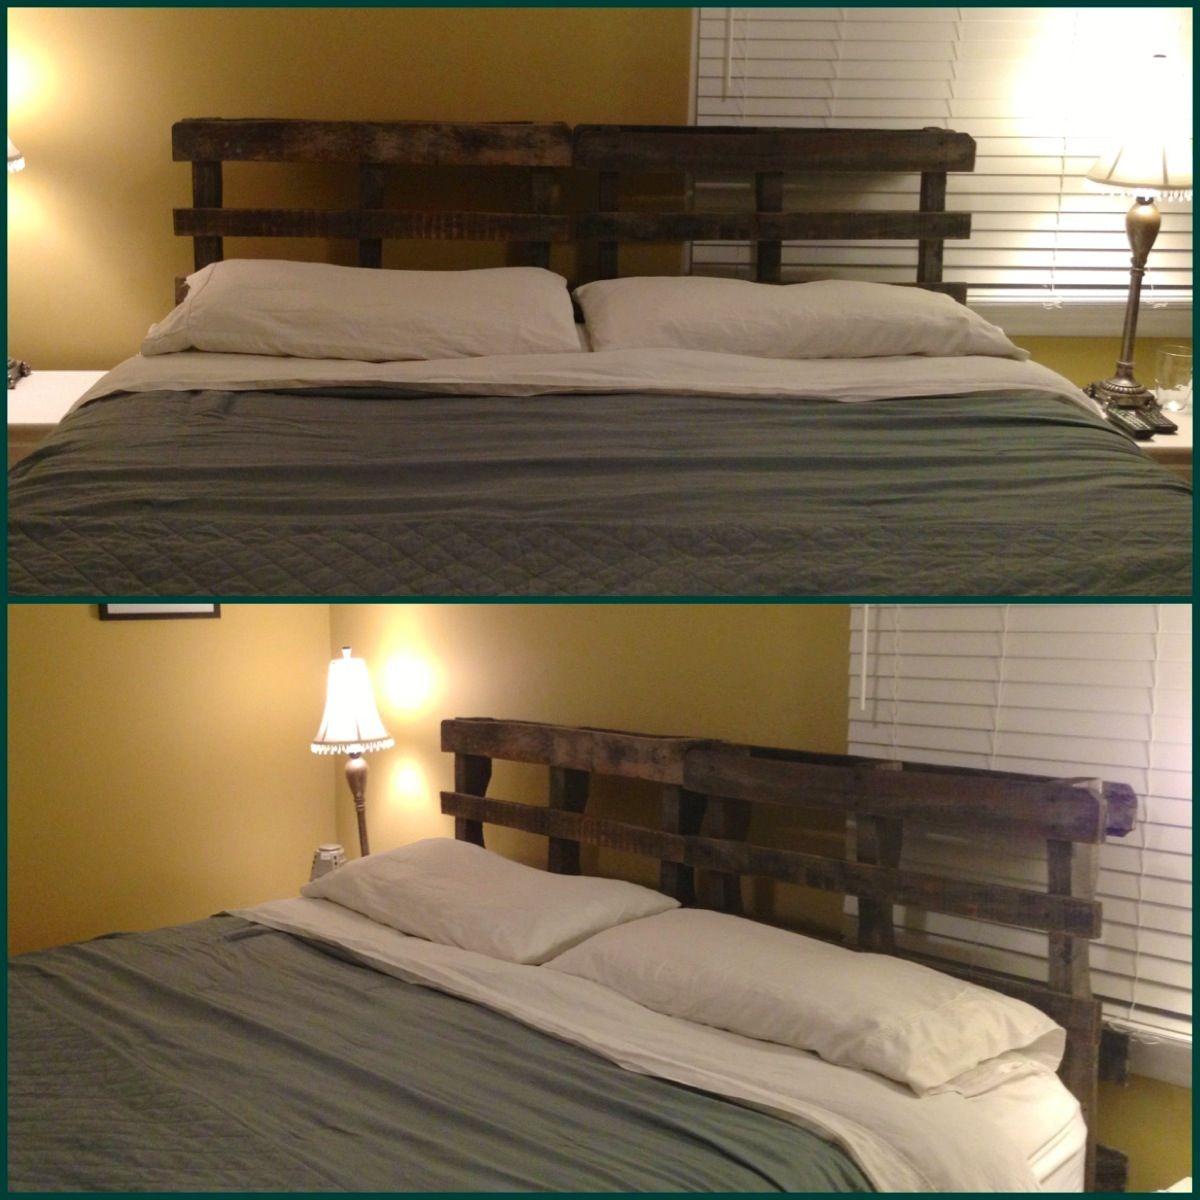 wooden pallet headboard home ideas pallet furniture pallet headboard designs. Black Bedroom Furniture Sets. Home Design Ideas